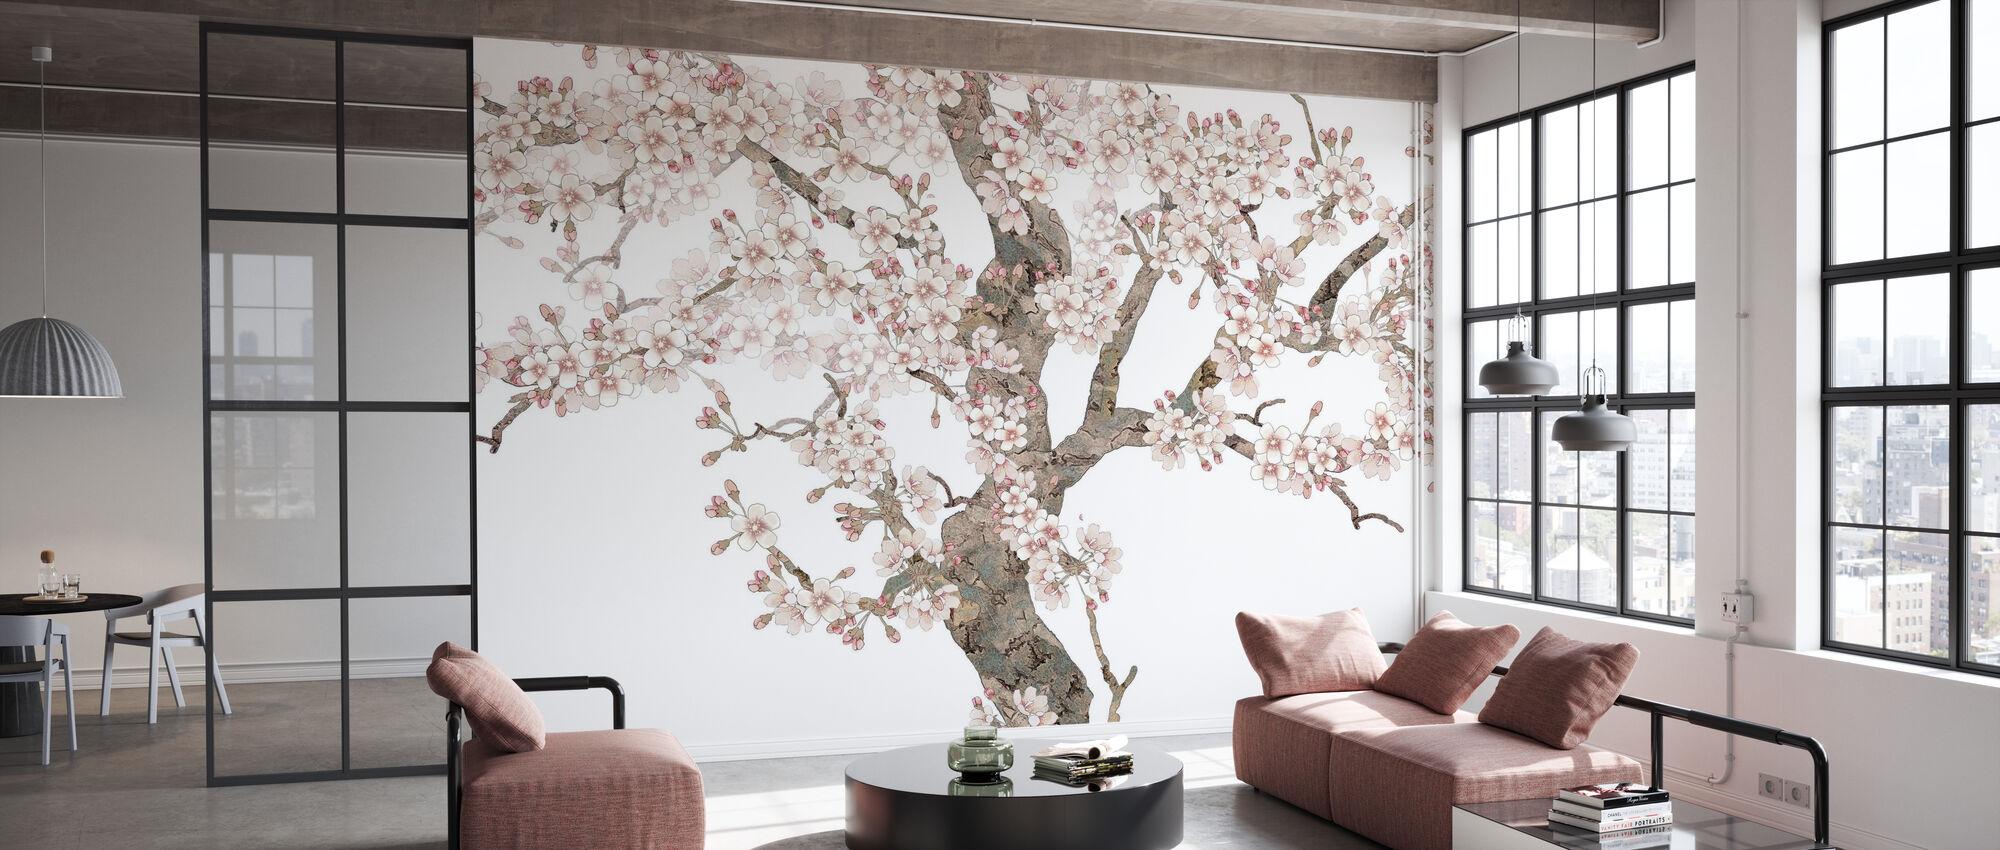 Doux Blossom - Wallpaper - Office